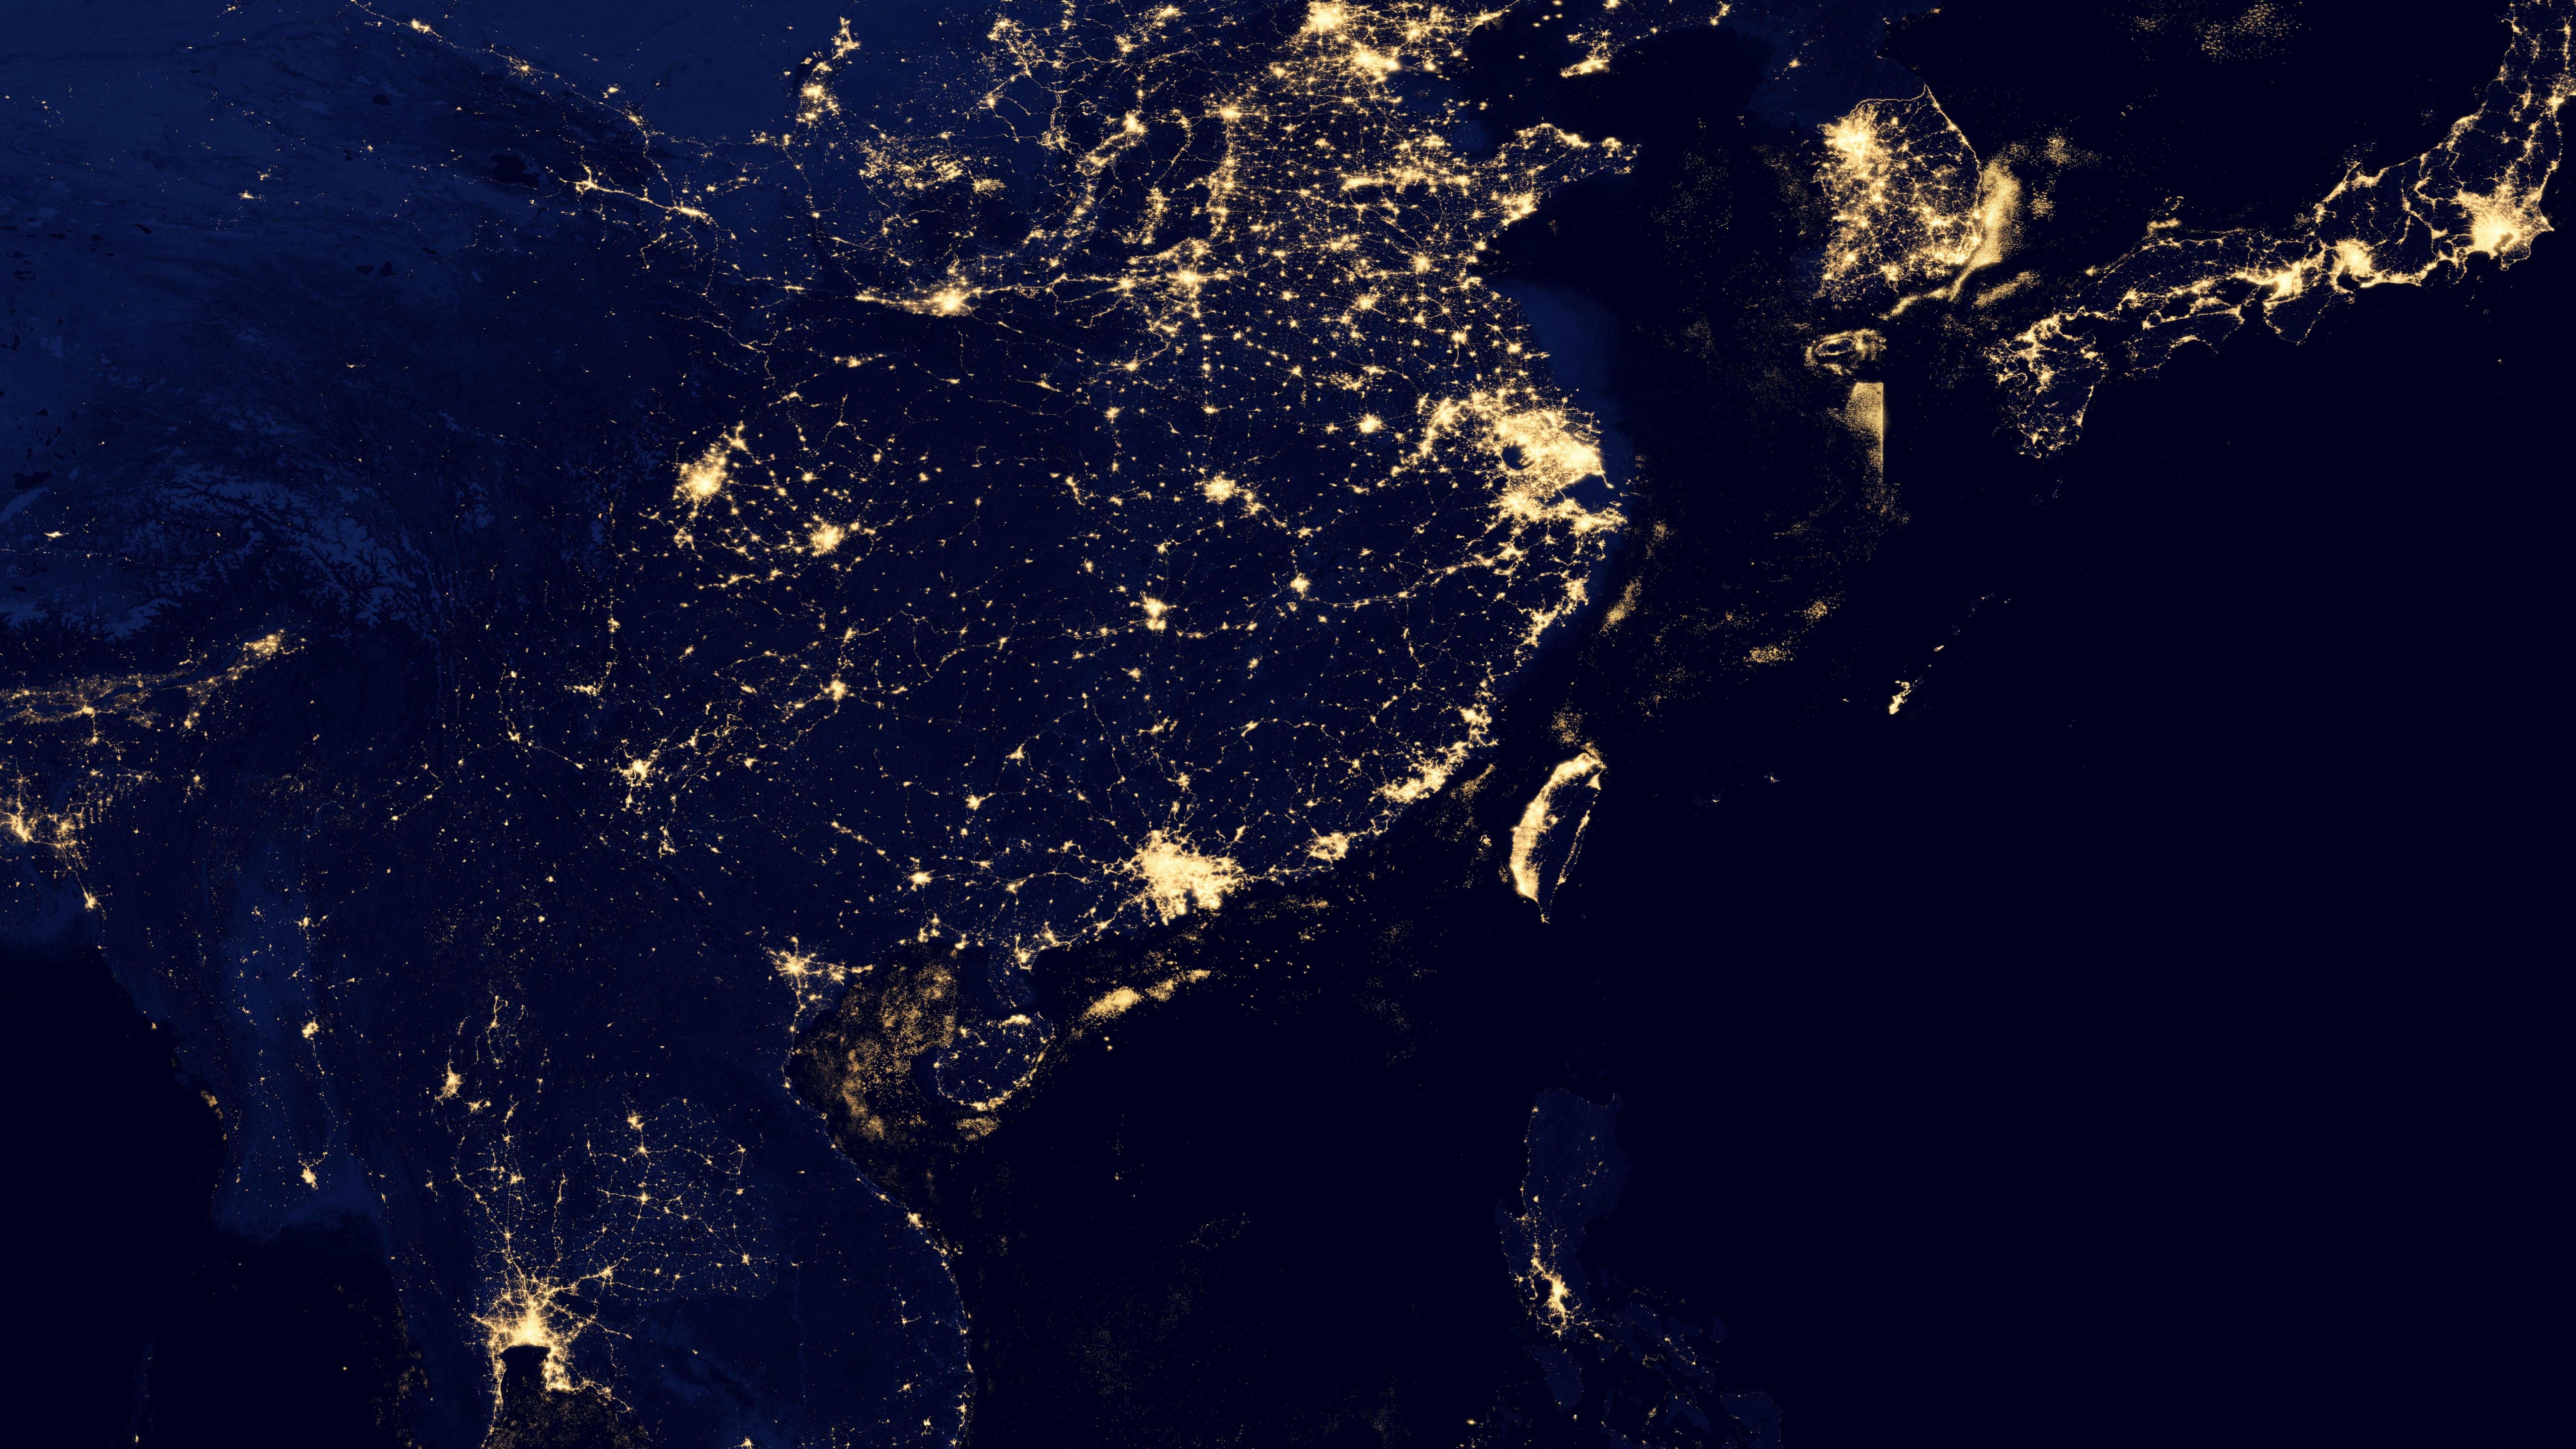 Night Lights of East Asia 2012 wallpaper